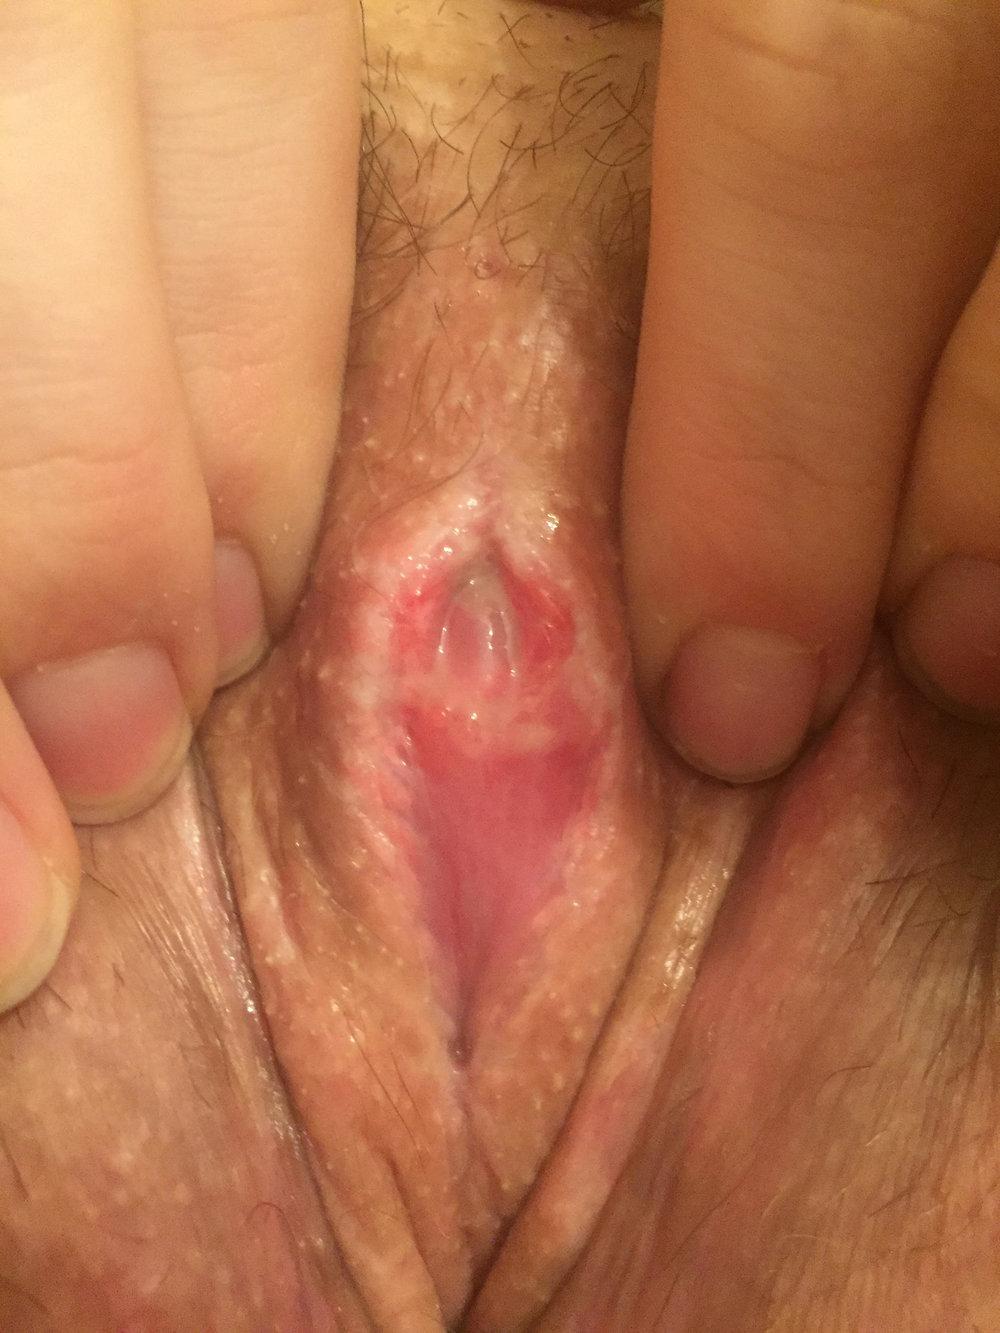 clitoris4.jpg